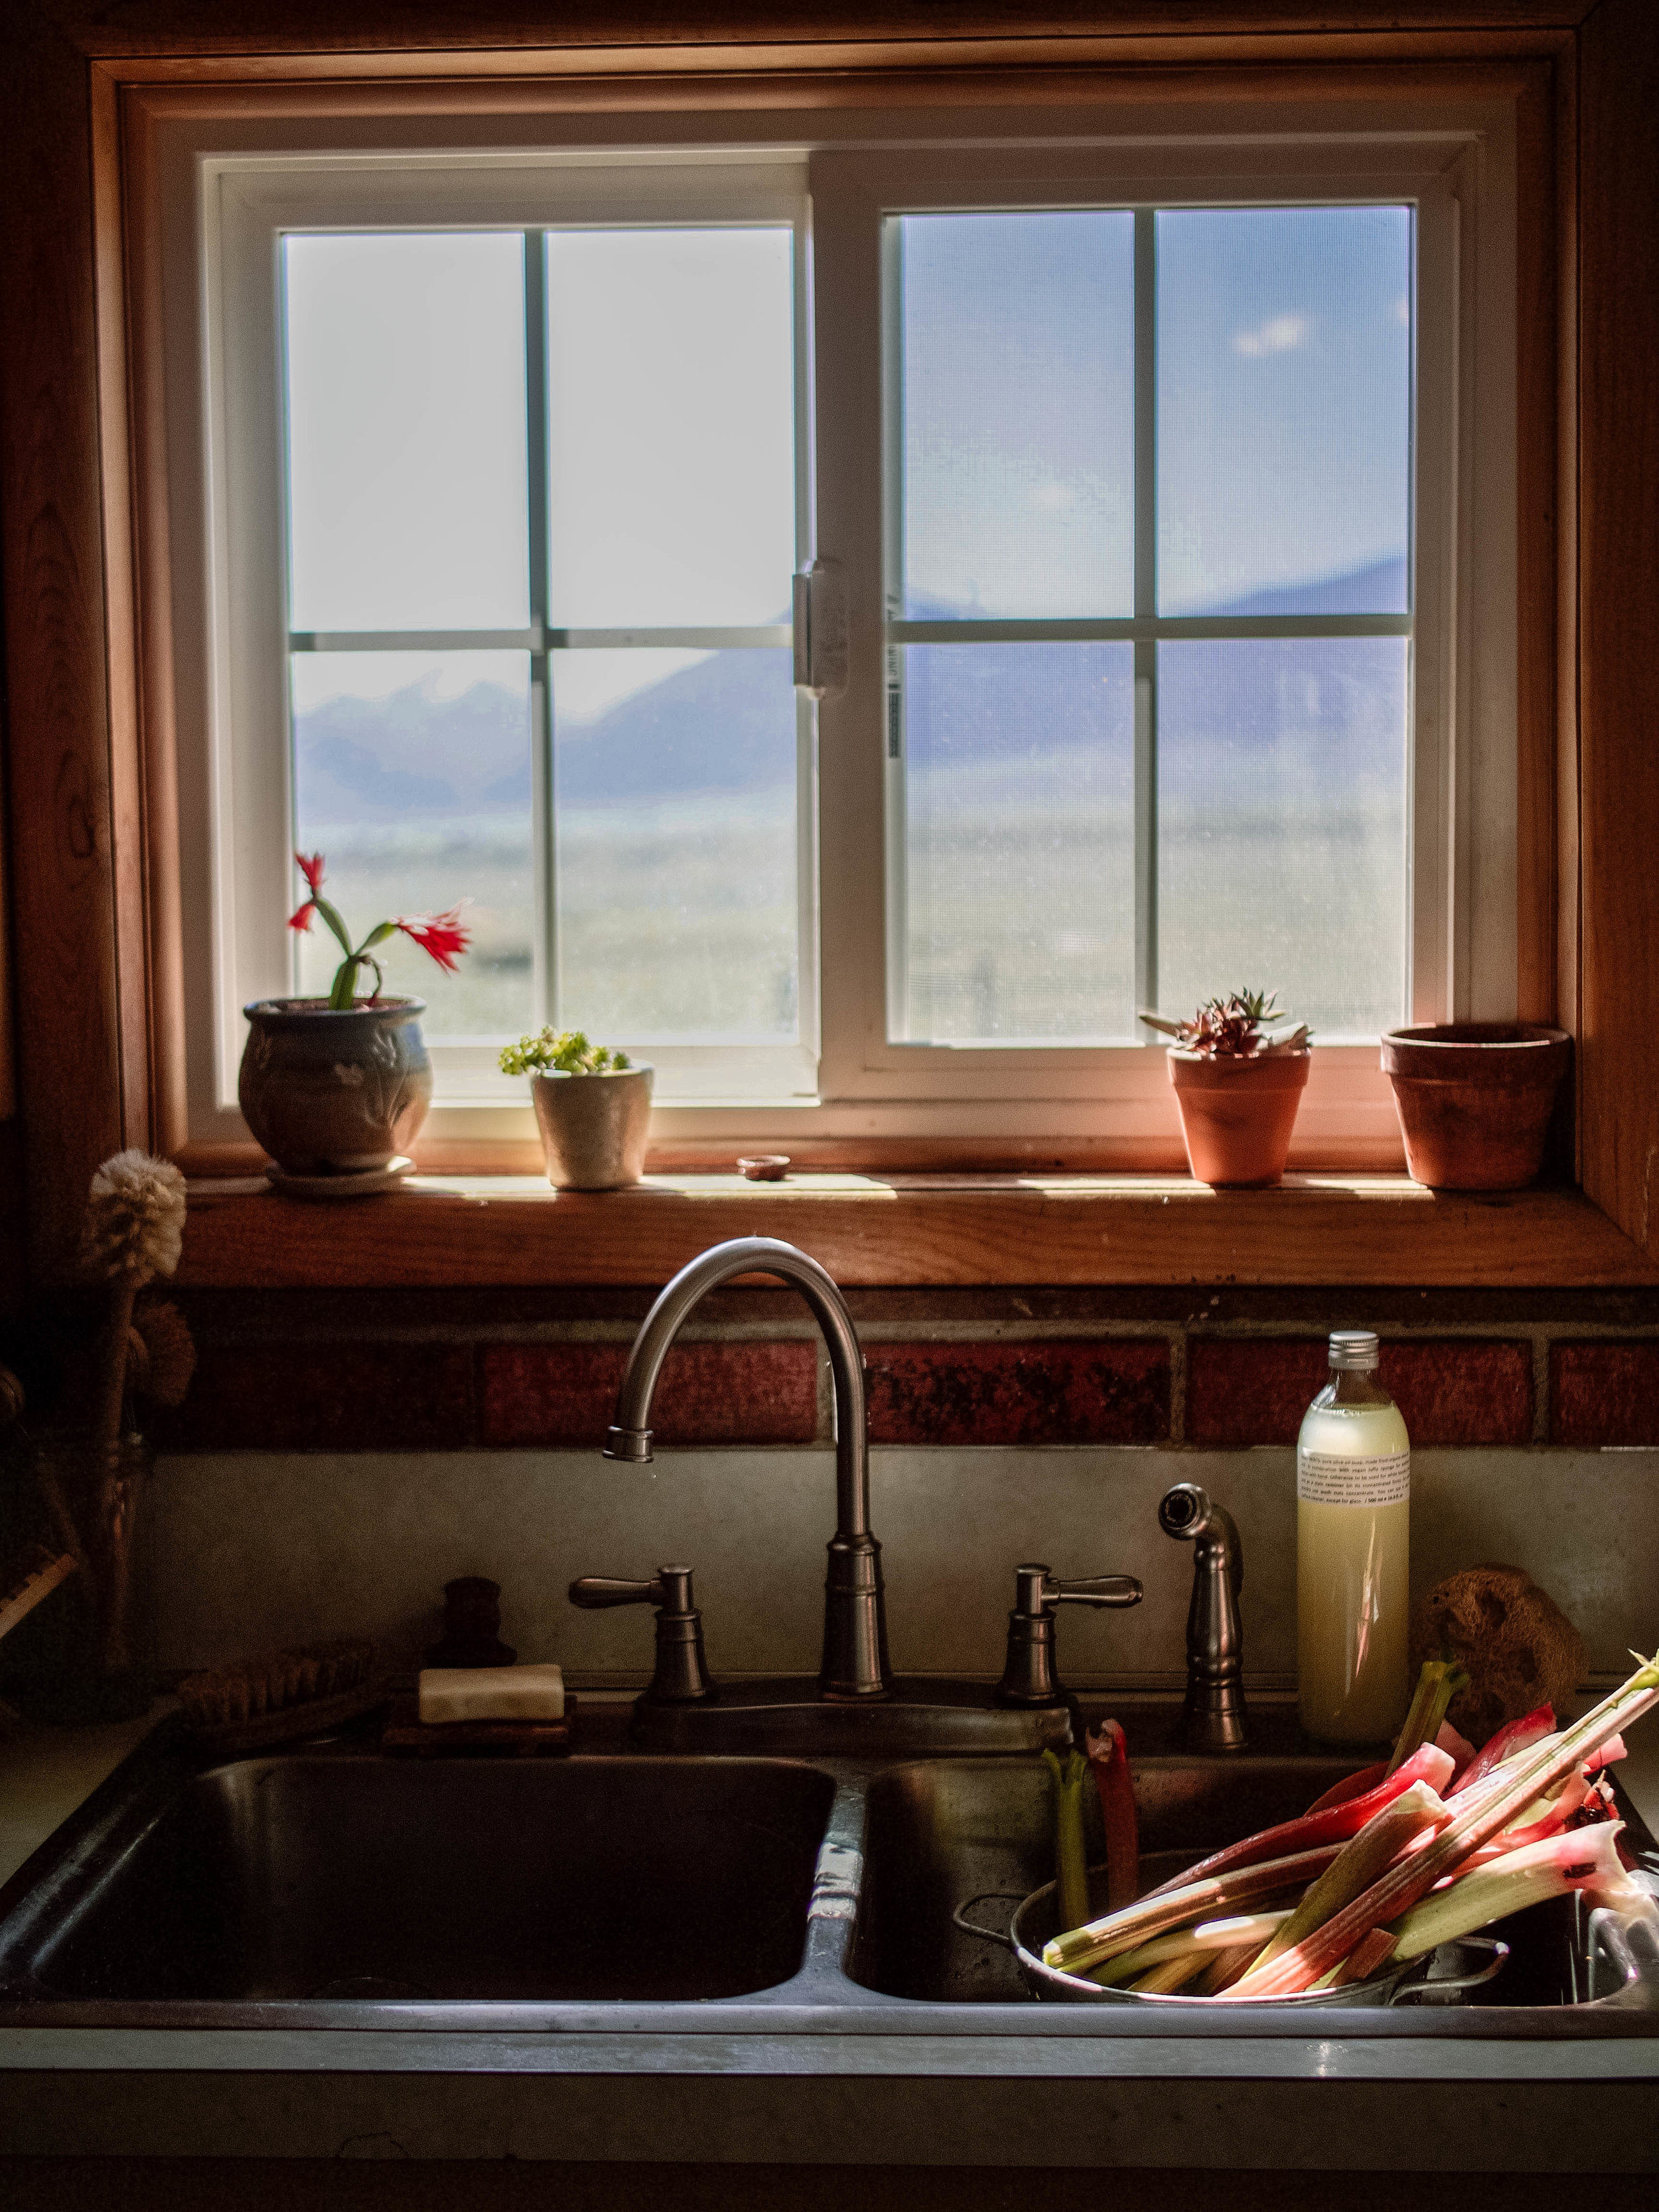 kitchen window with rhubarb